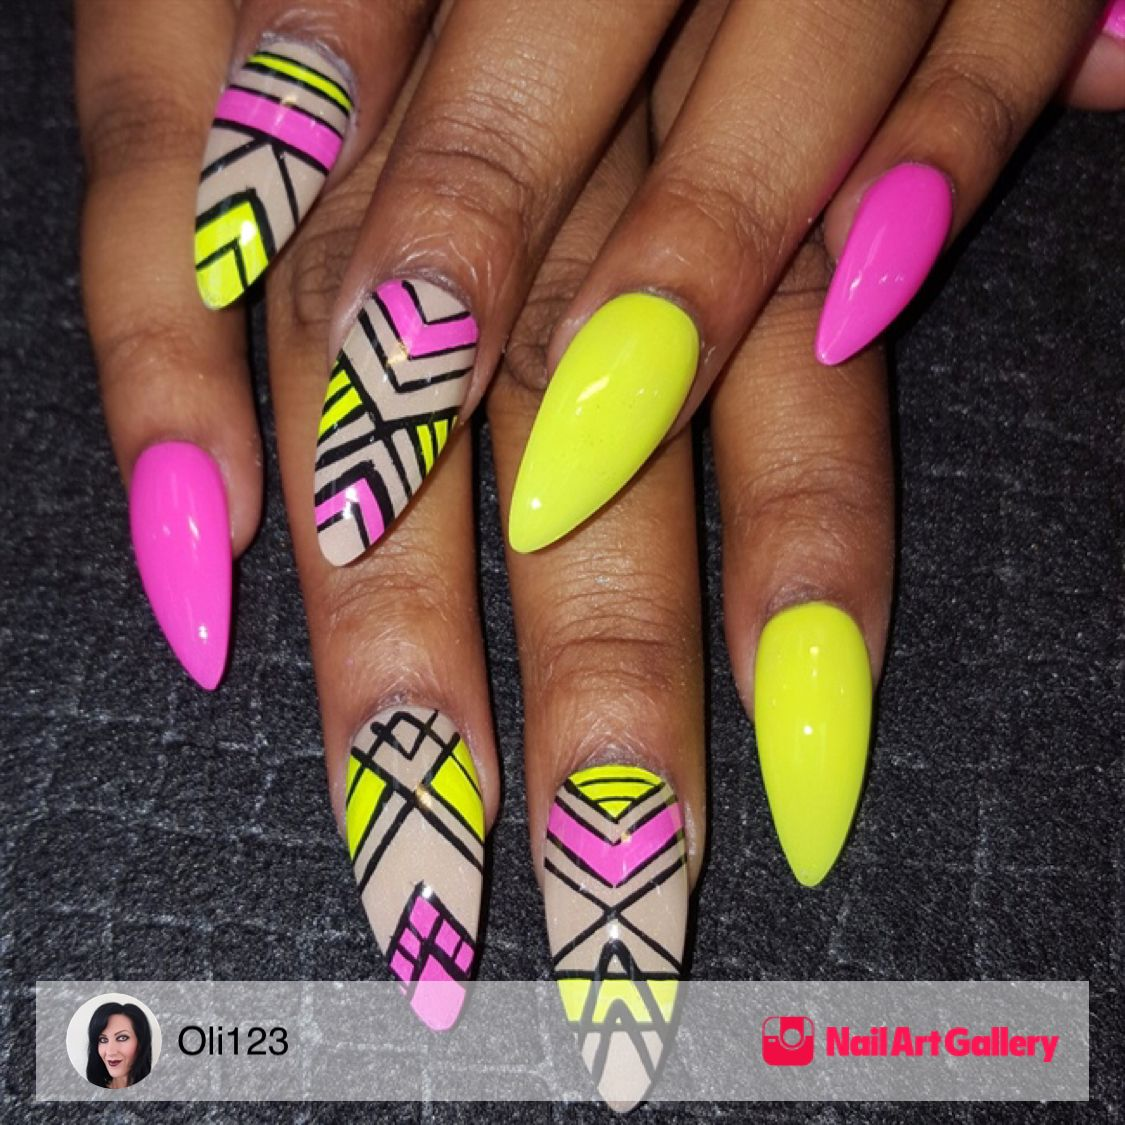 Neon Mix by Oli123 via Nail Art Gallery #nailartgallery #nailart #nails  #handpainted - Neon Mix By Oli123 Via Nail Art Gallery #nailartgallery #nailart